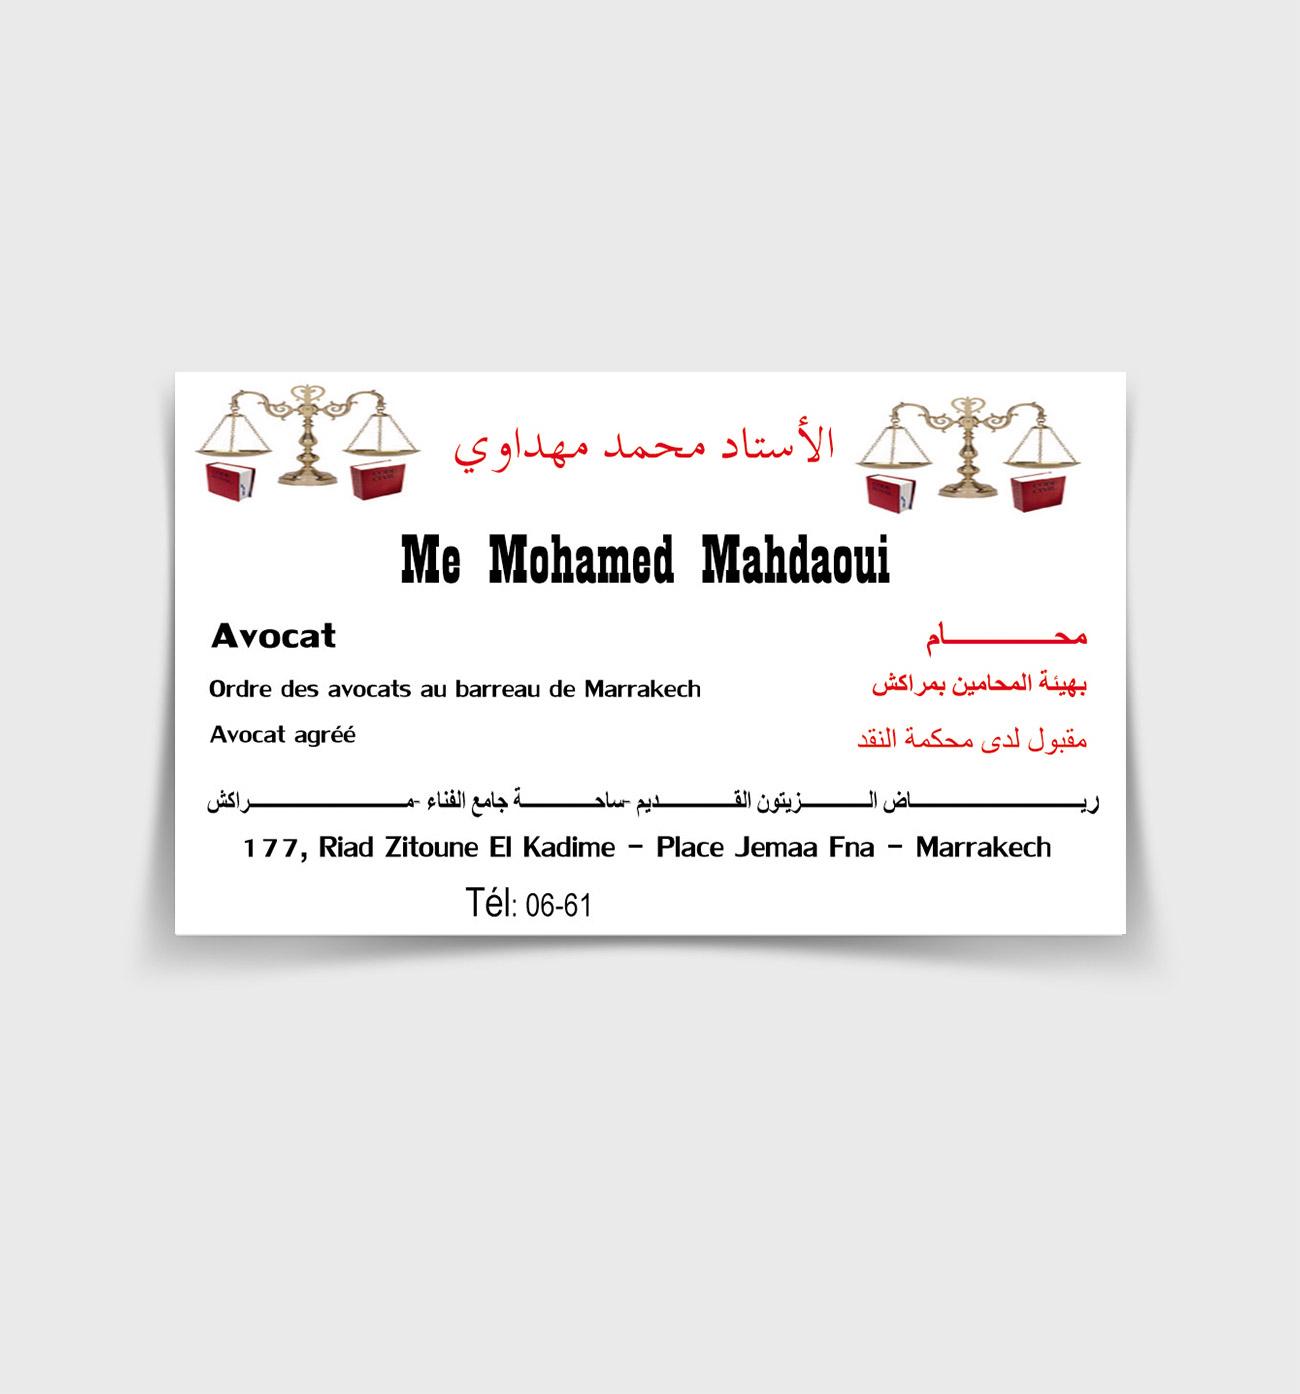 Me Mohammed Mahdaoui Avocat